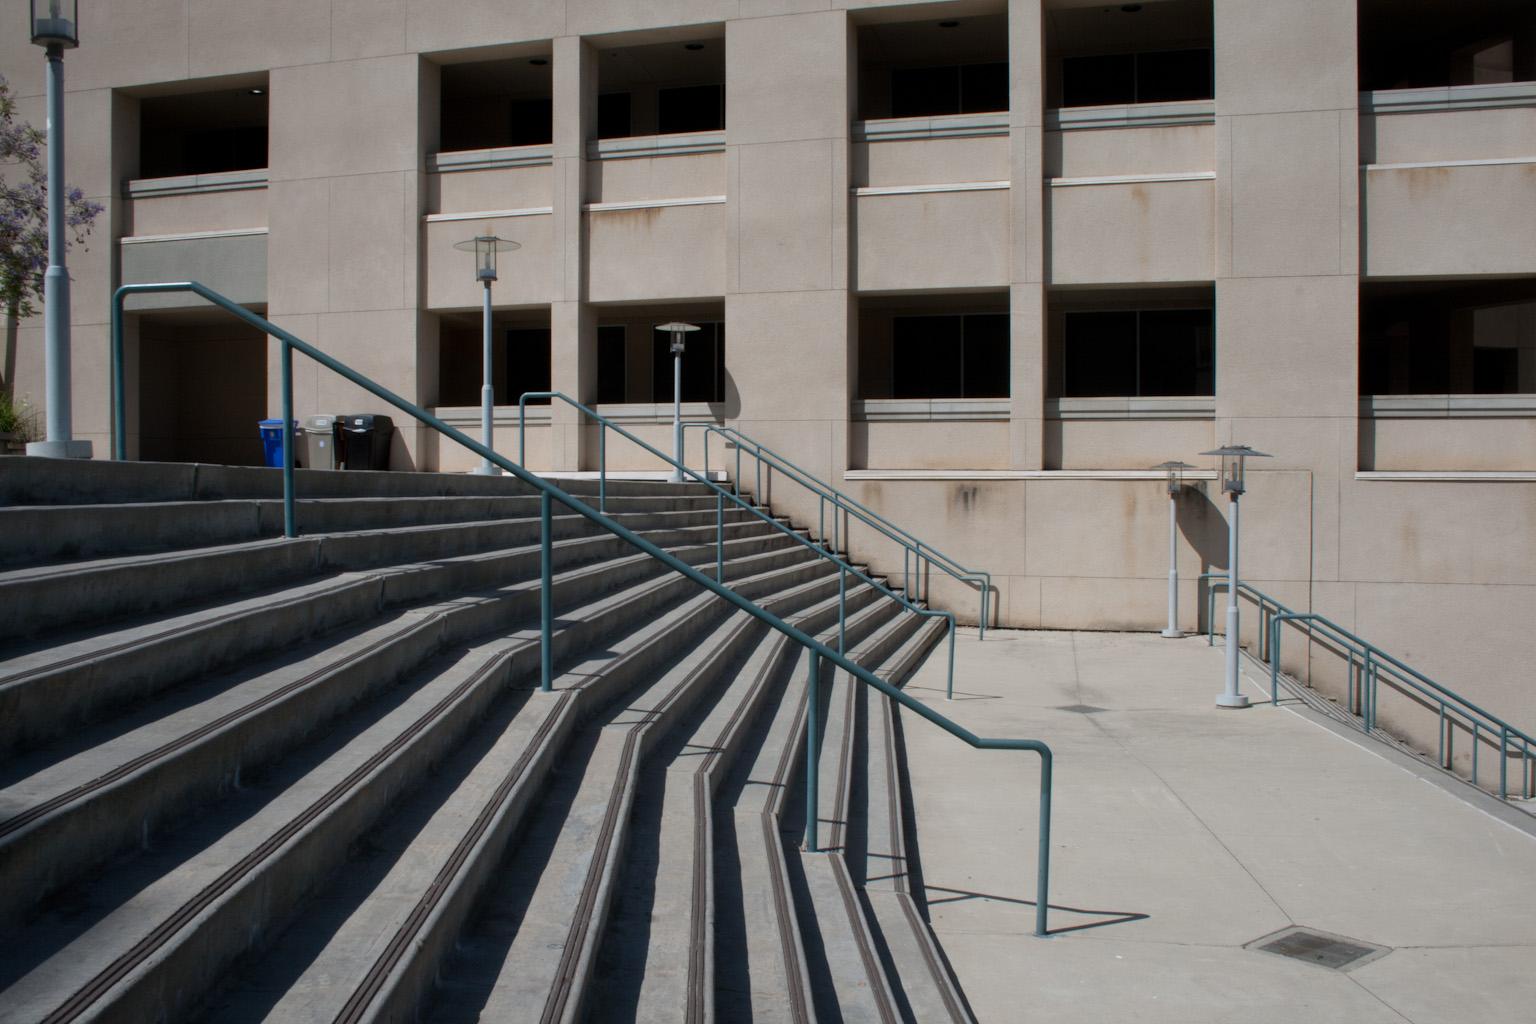 CSUSM Stairs bracket 0